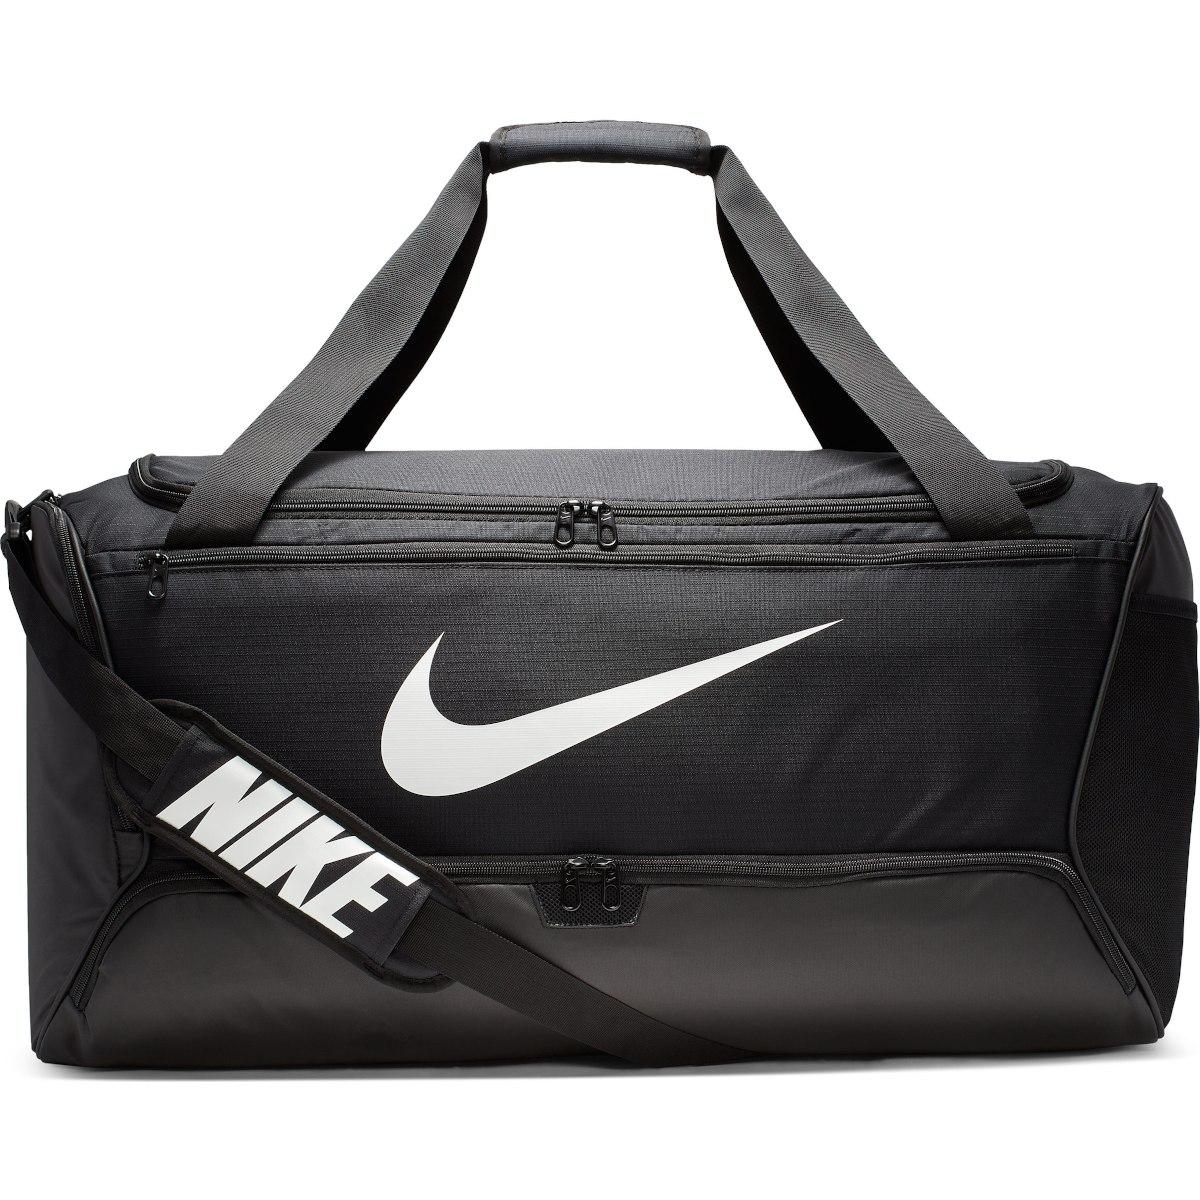 Produktbild von Nike Brasilia Large Duffel Bag Sporttasche - 95L - black/black/white BA5966-010